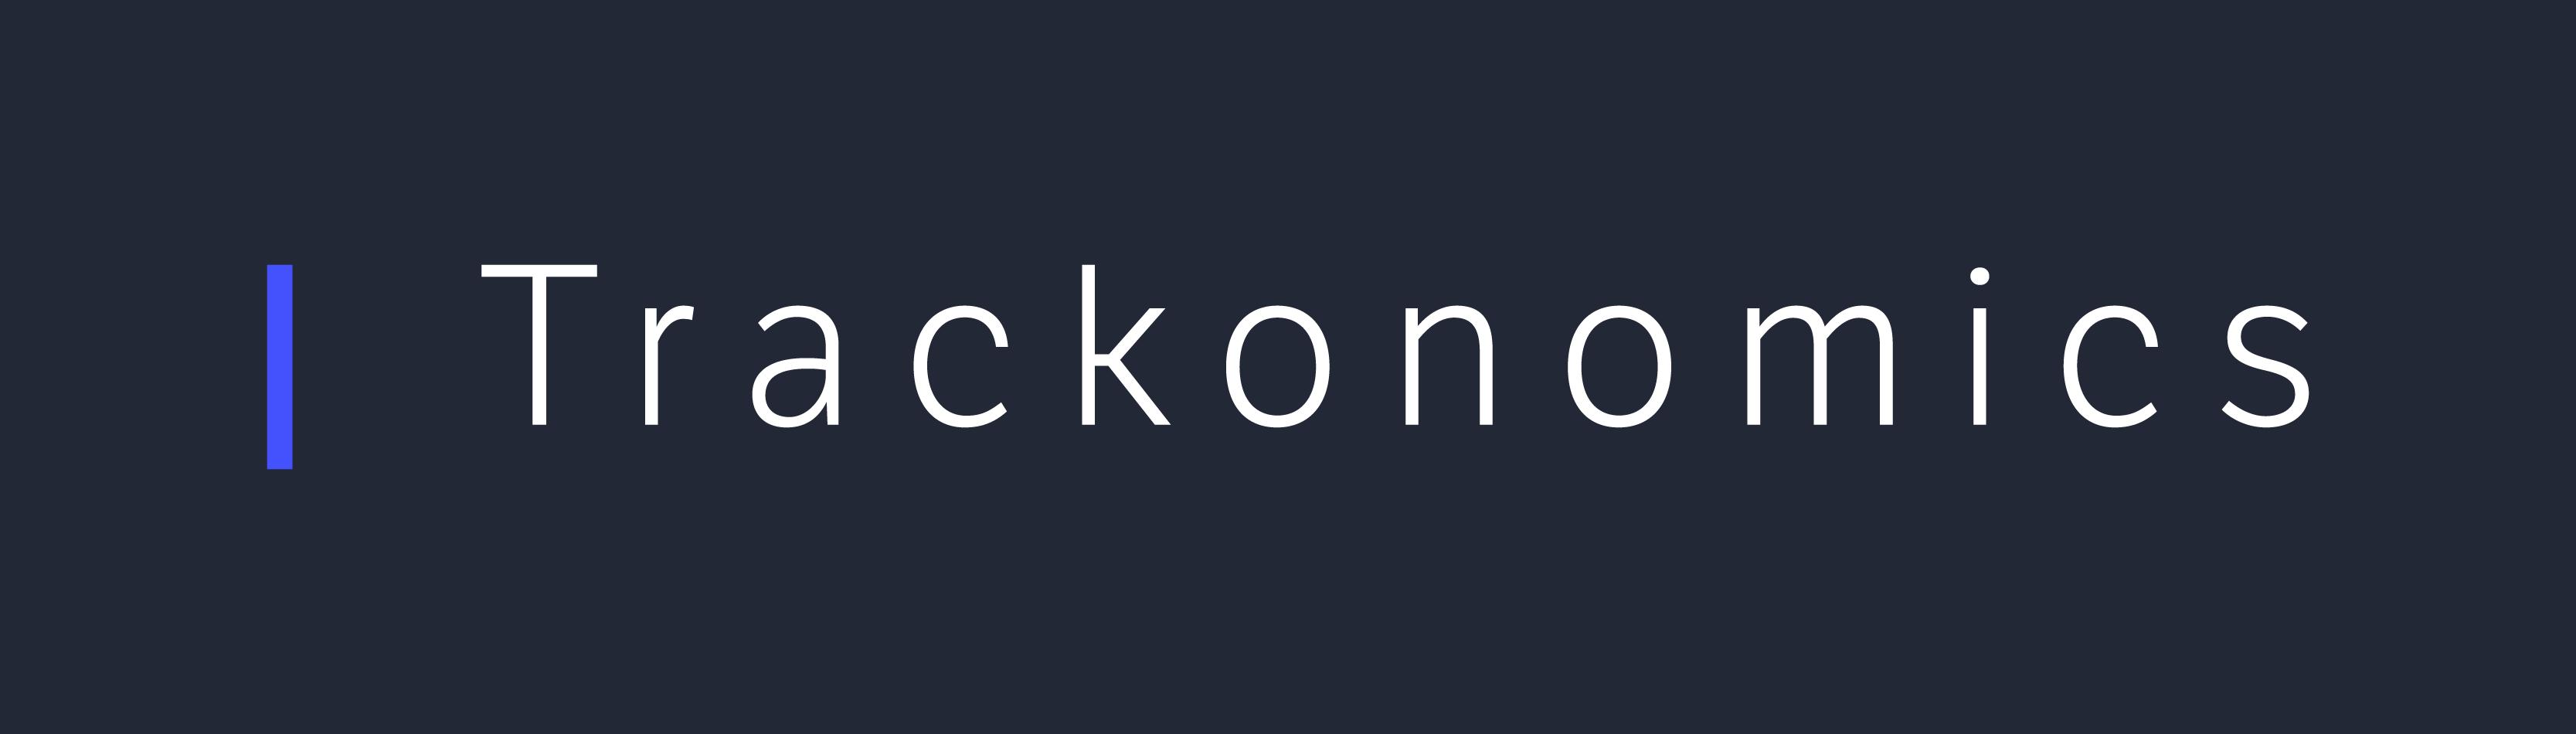 Trackonomics